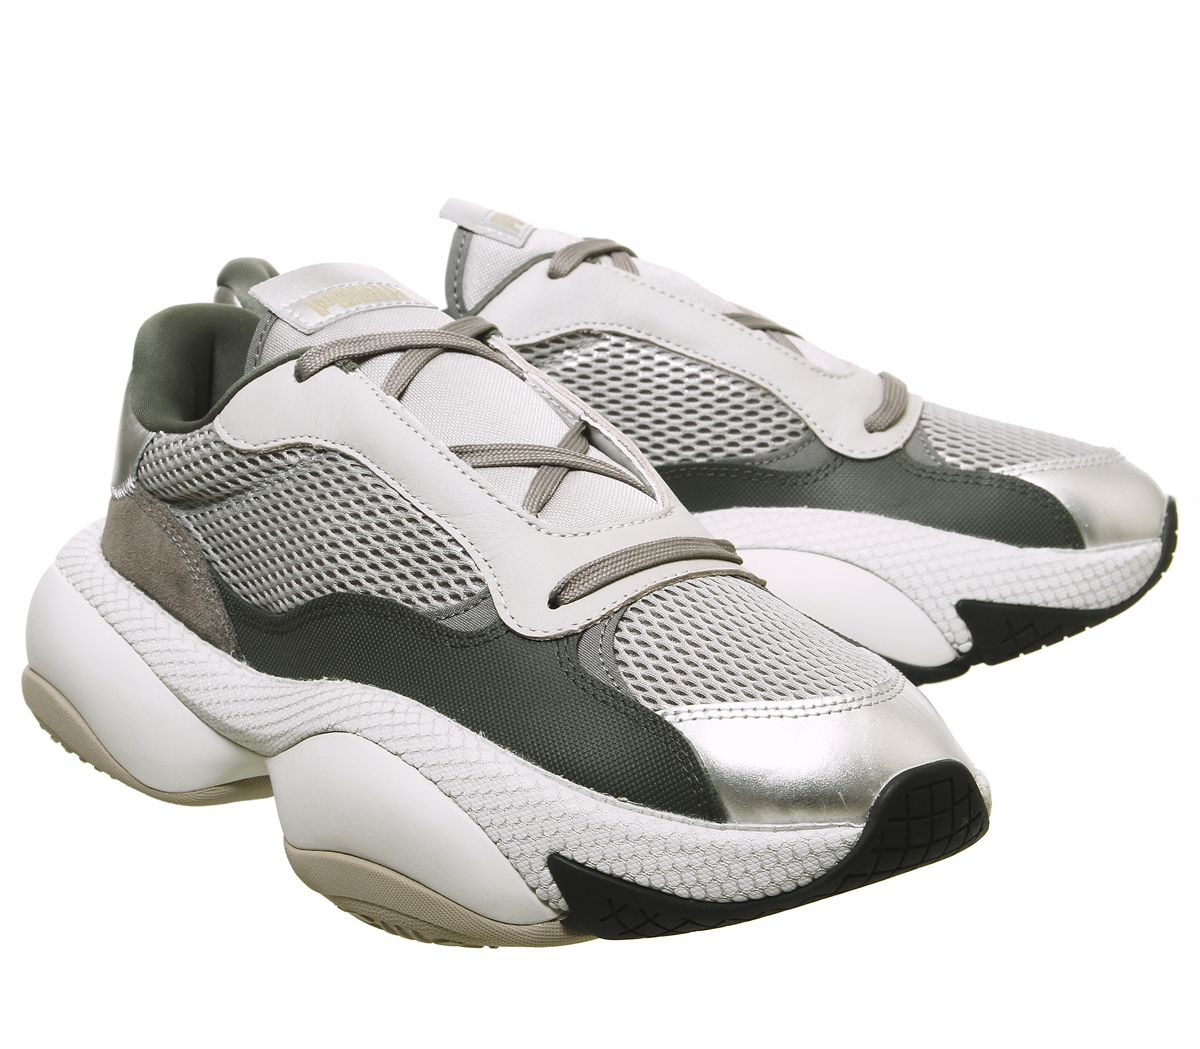 Puma-Alteration-Baskets-Puma-Silver-calcaire-Baskets-Chaussures miniature 5